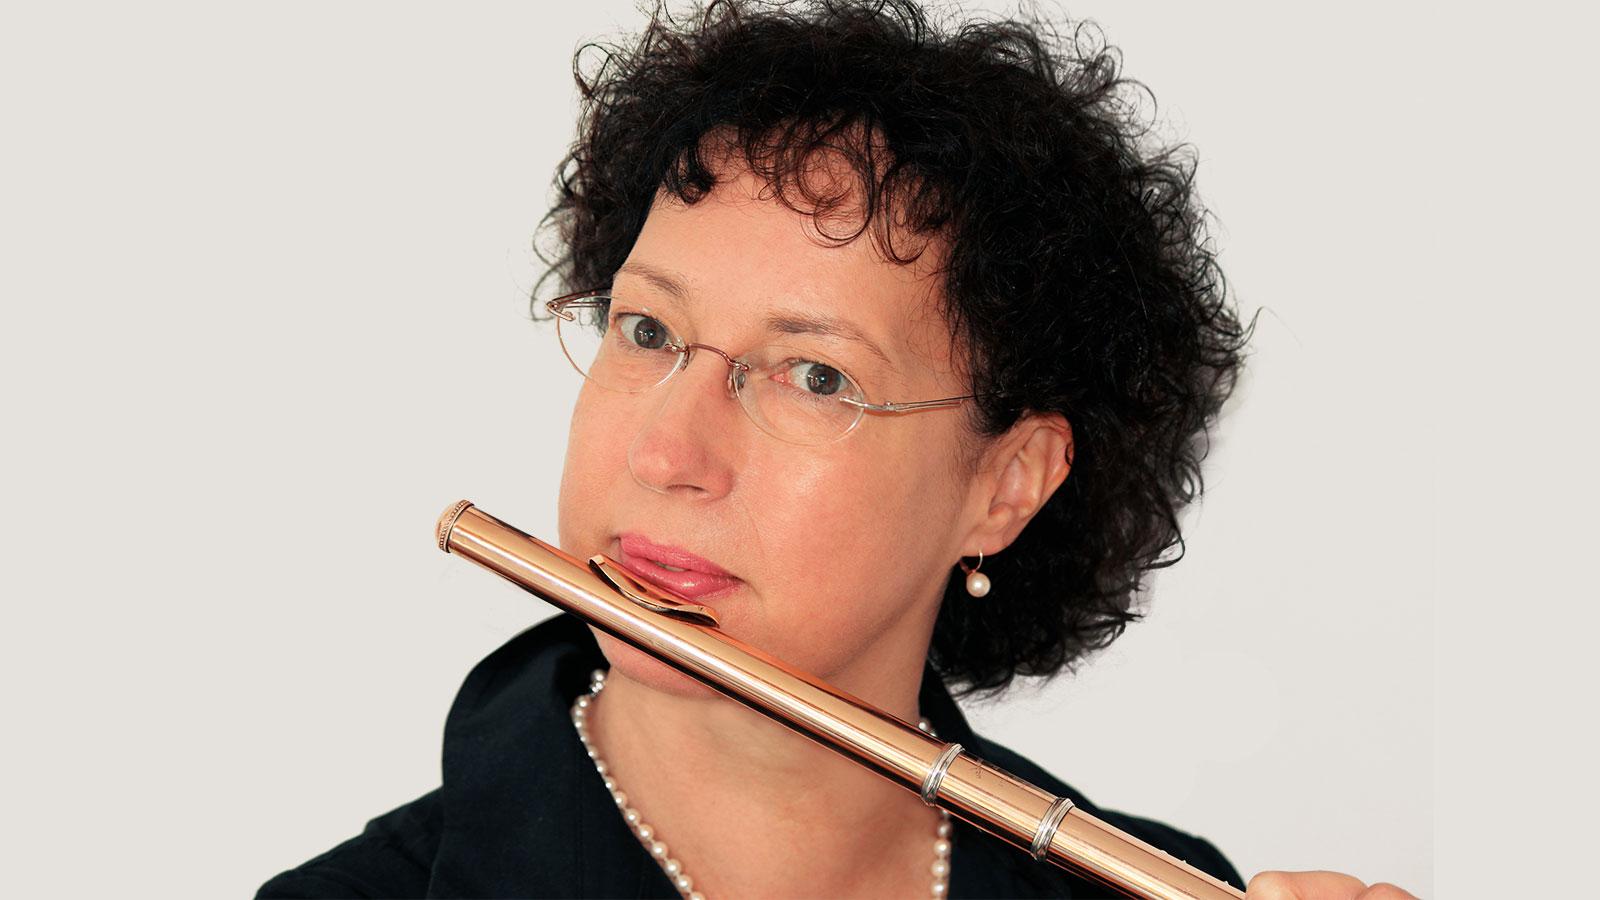 Johanna-Daske-Duo-Dali-Quer-flöte-Harfe-Liebert-Olivenbaum